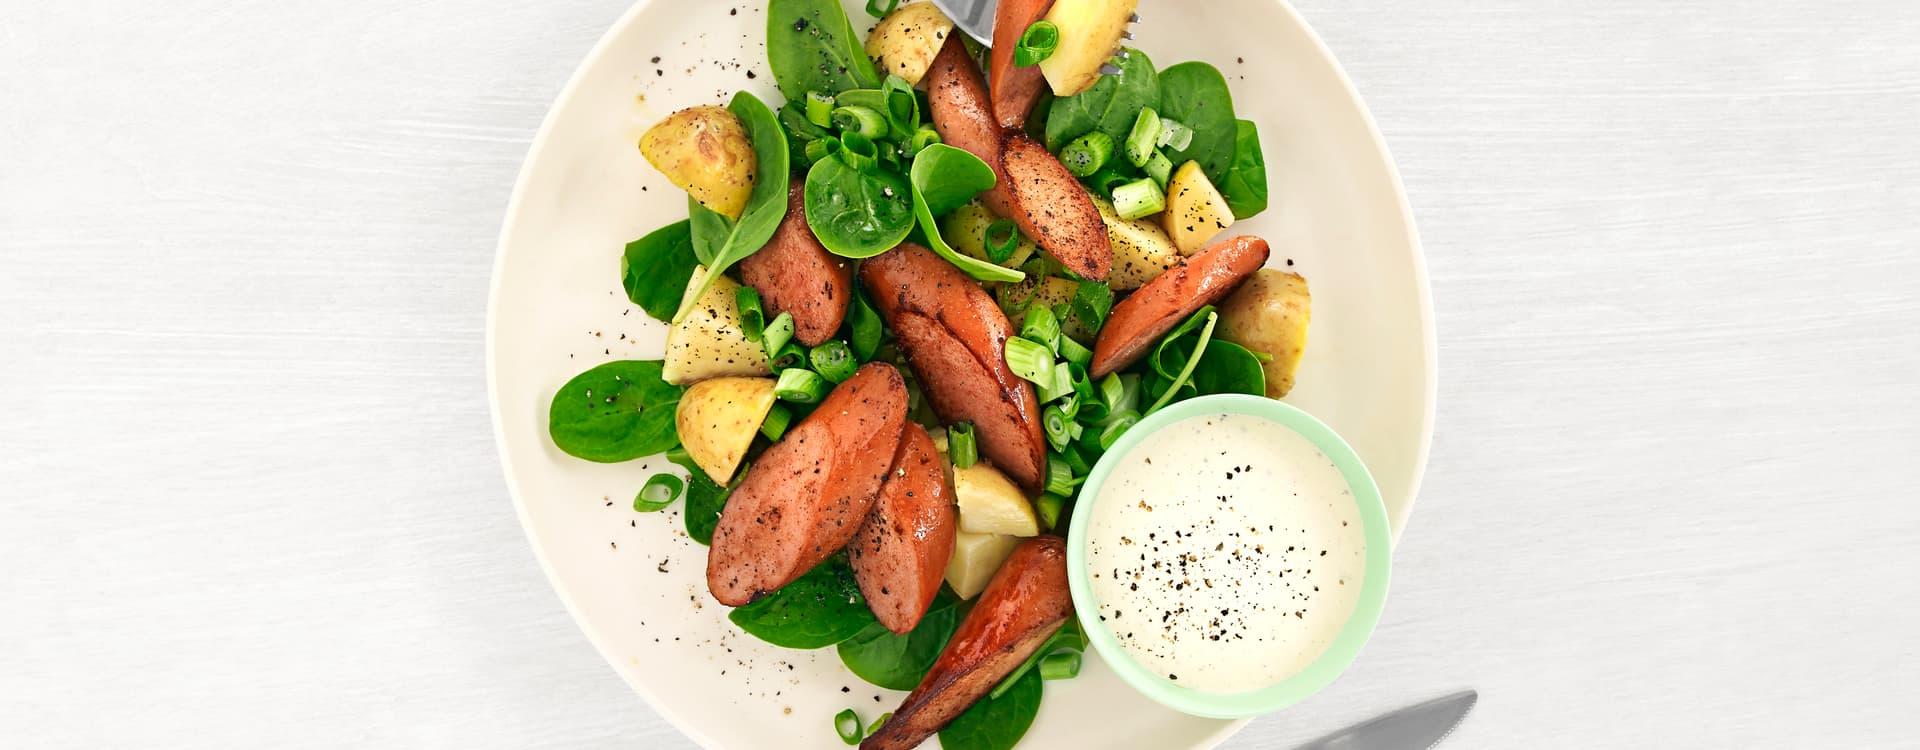 Spinatsalat med pølser, poteter og hvitløksrømme